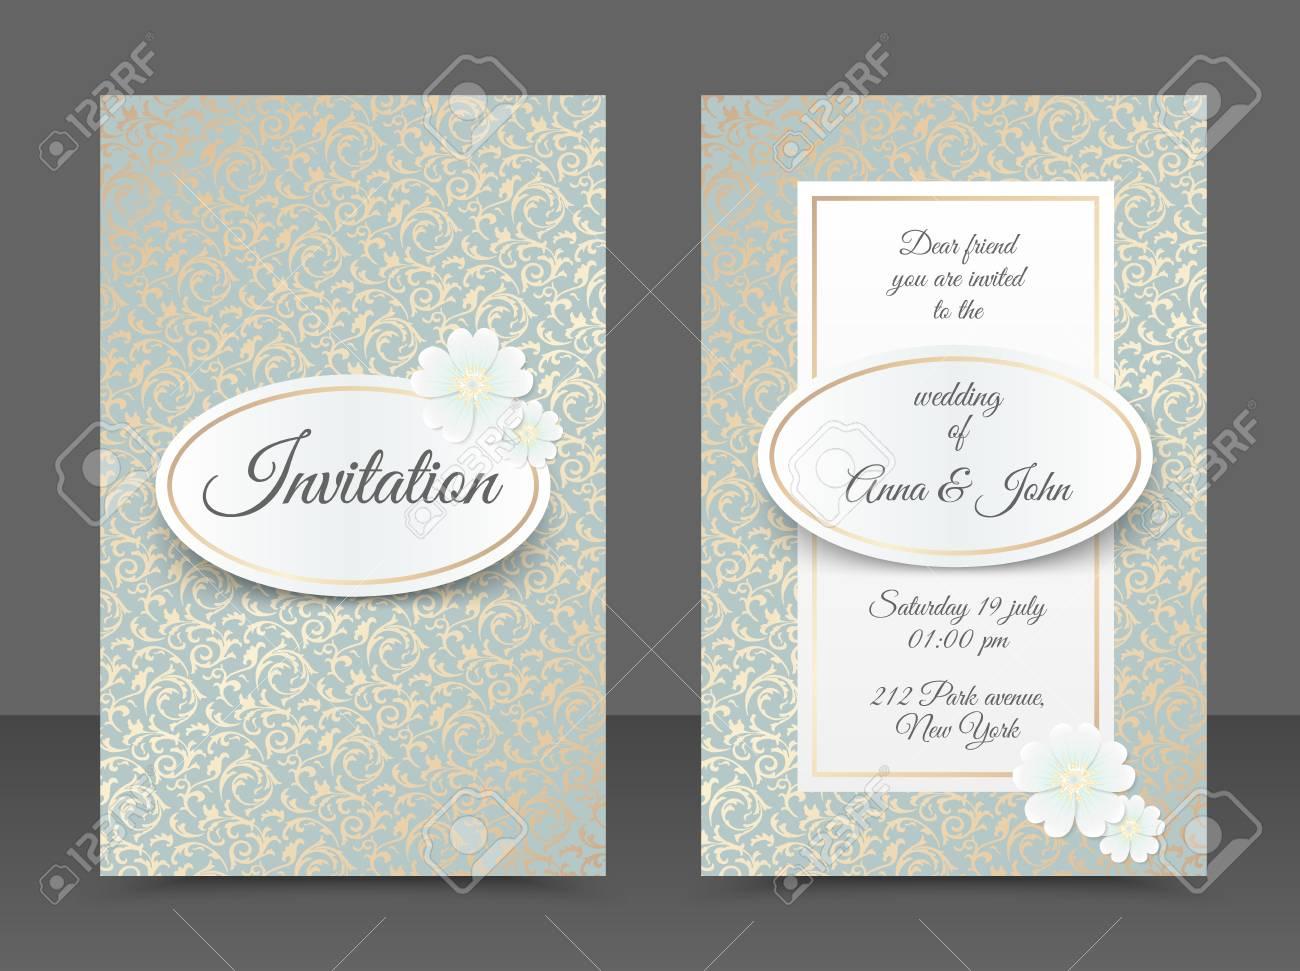 Vintage Wedding Invitation Templates Cover Design With Golden